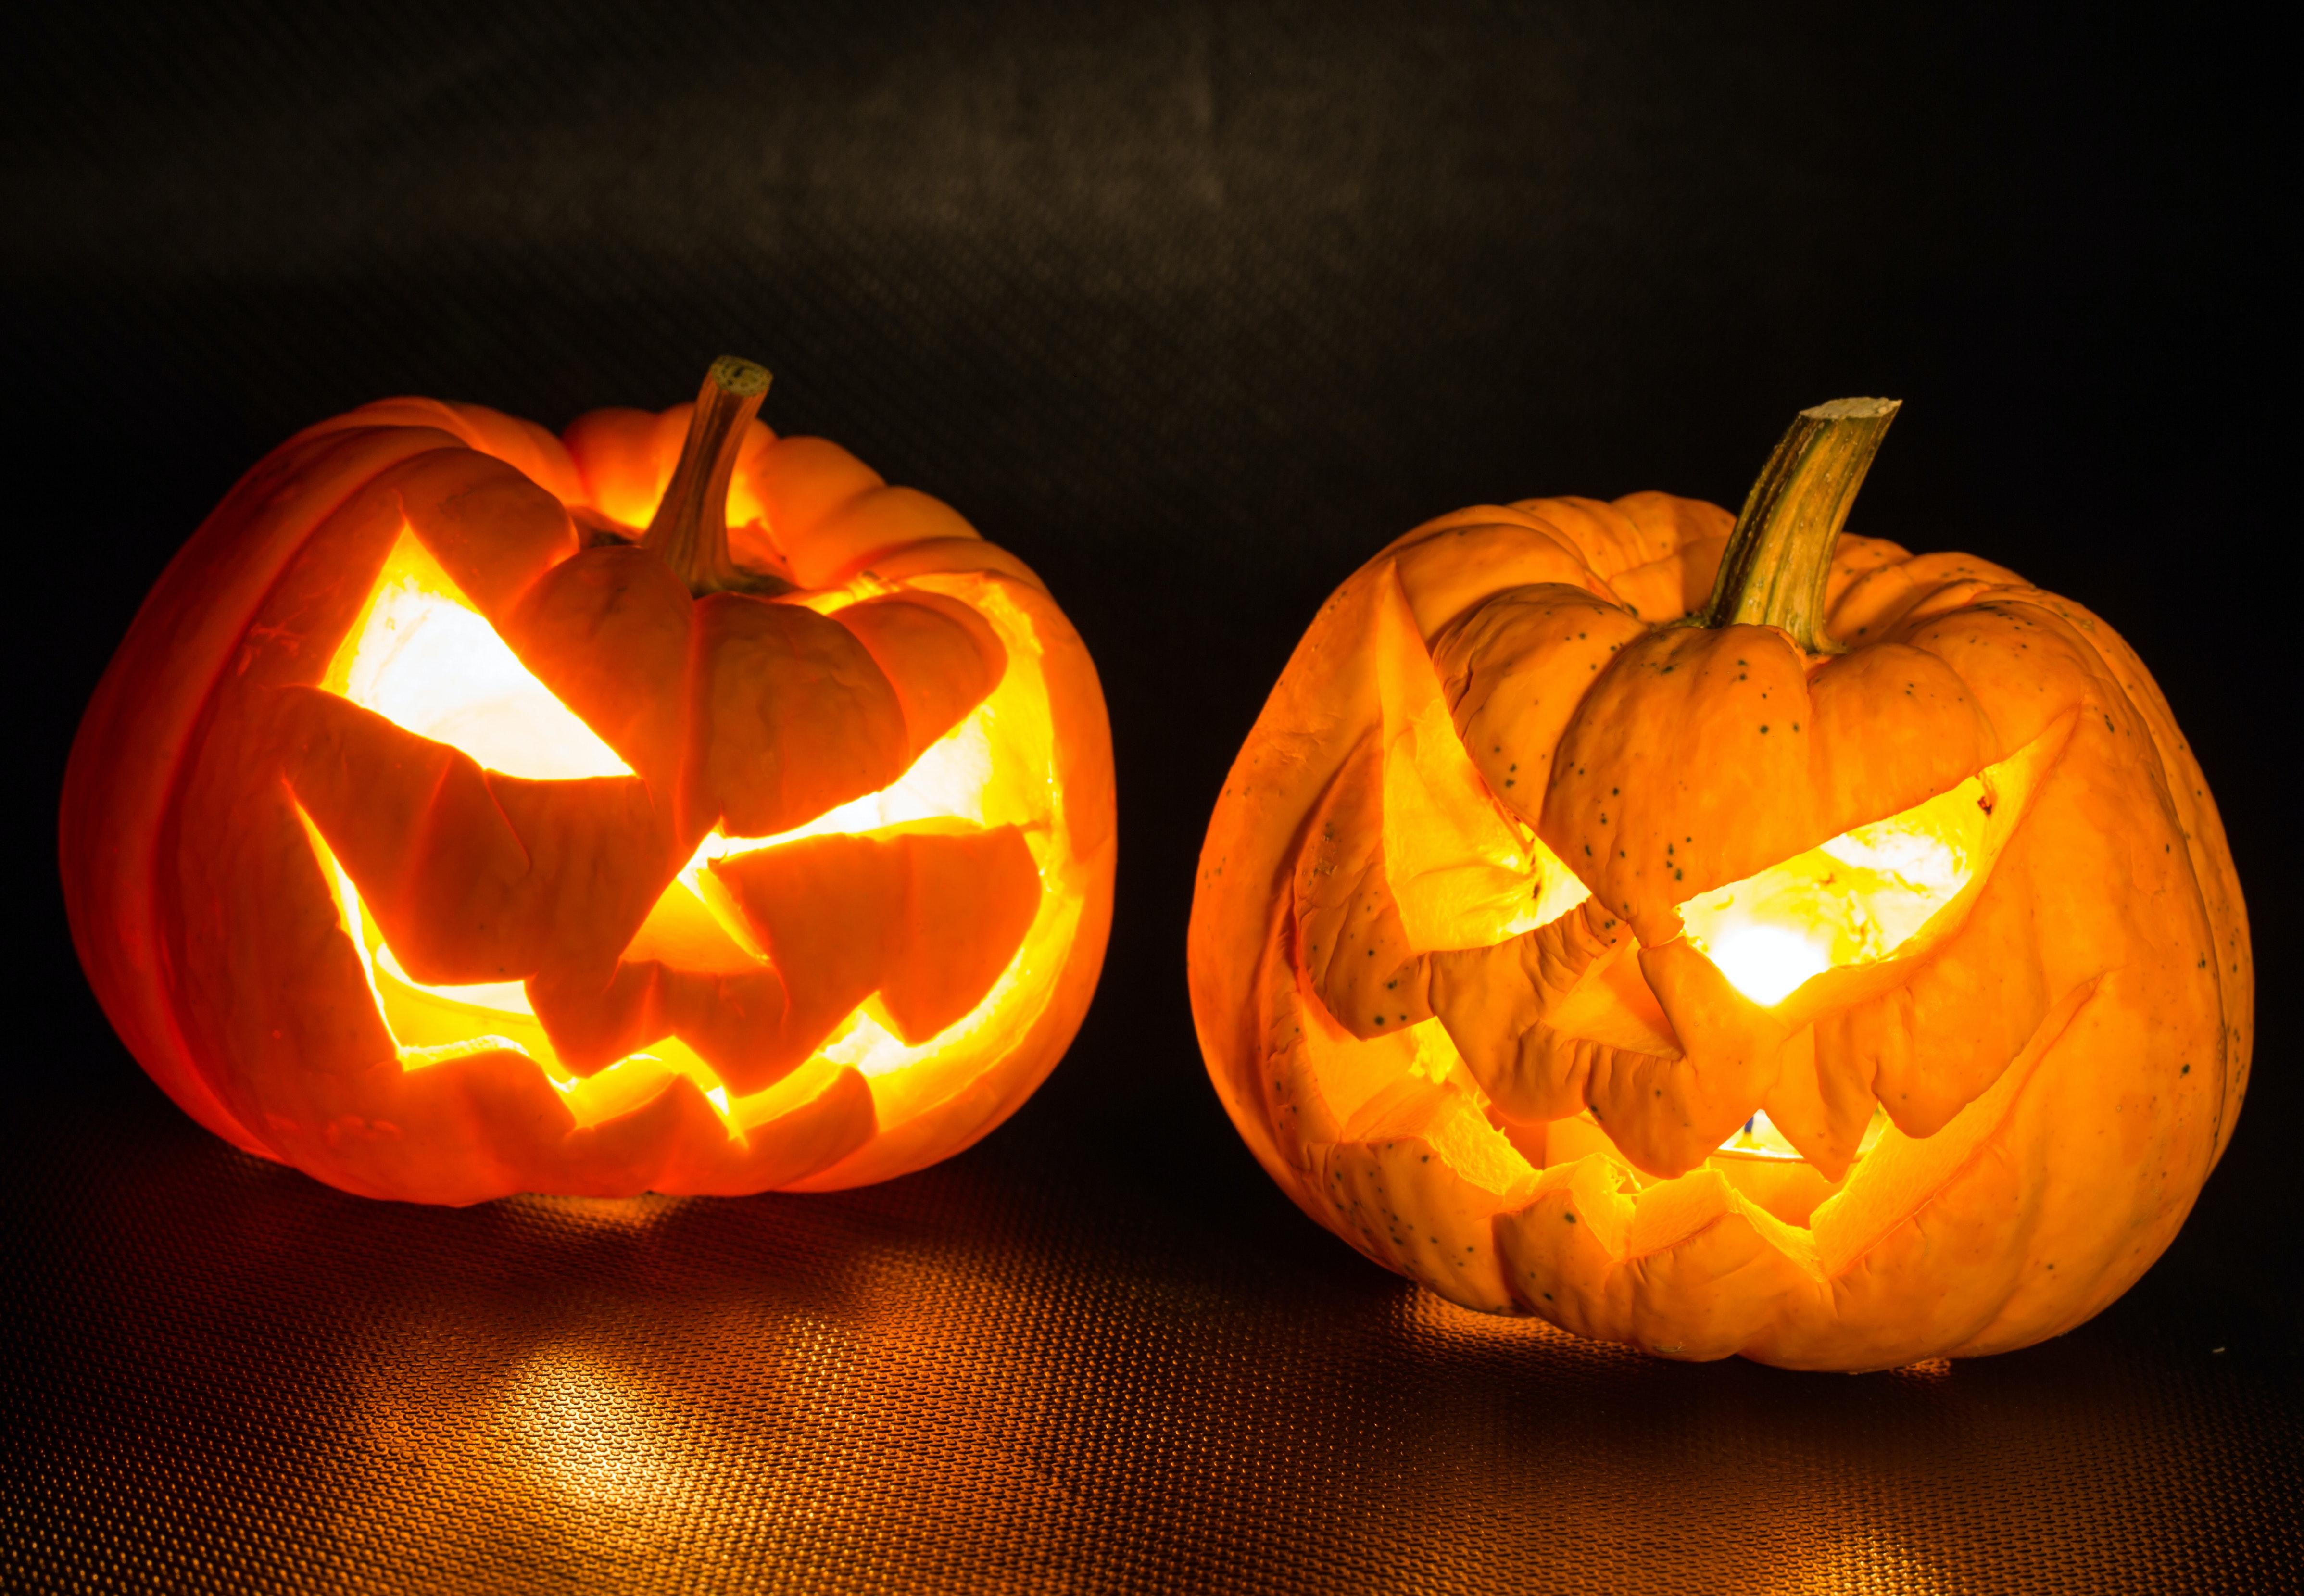 hvorfor holder vi halloween